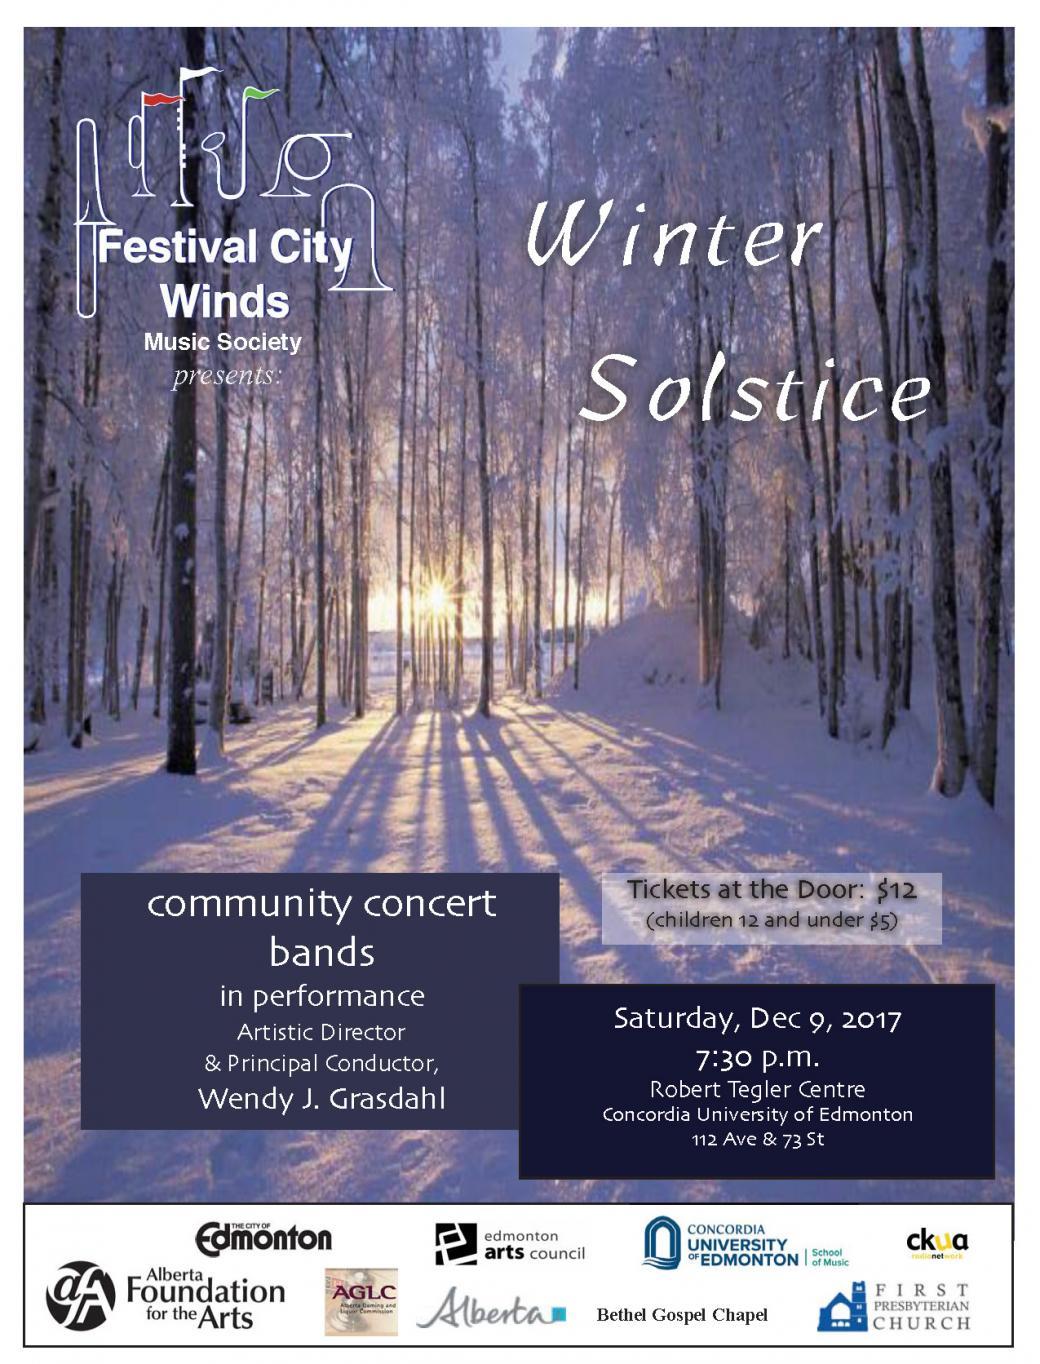 Festival City Winds - Winter Solstice